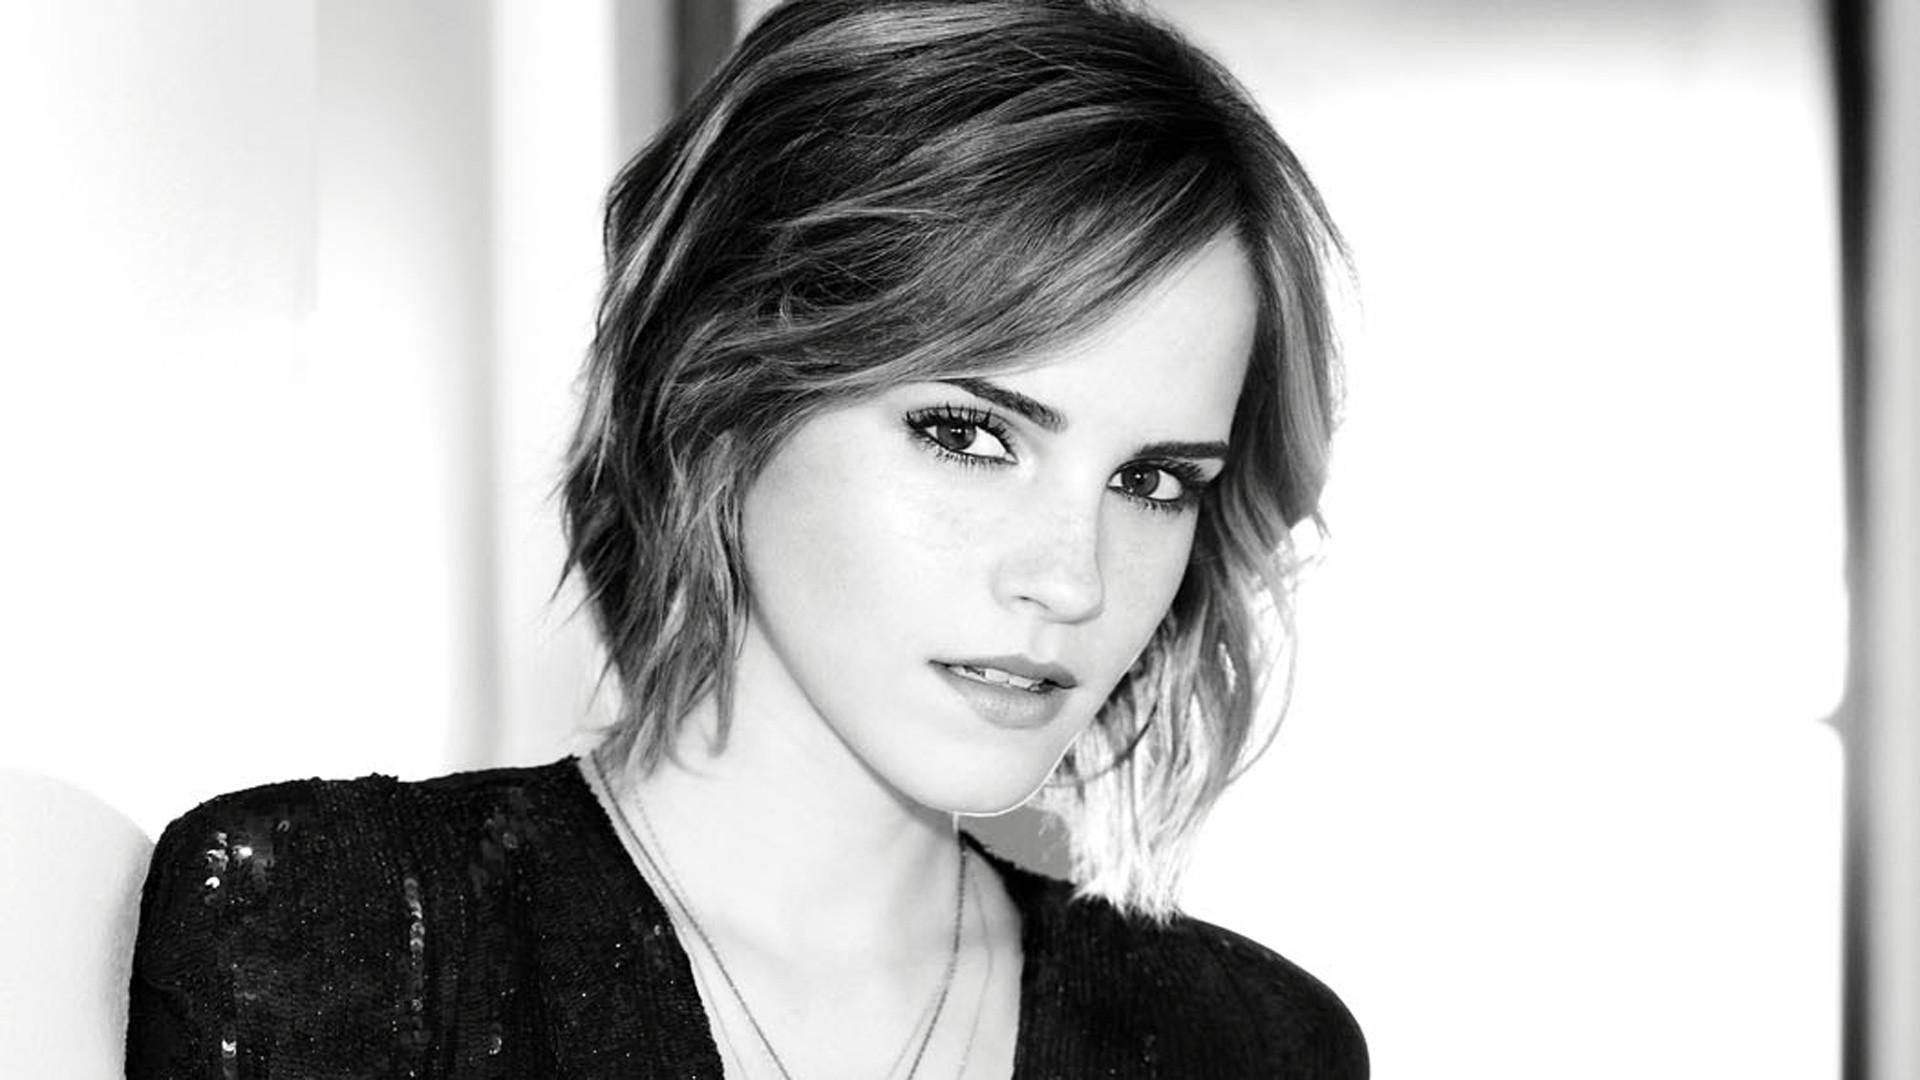 Emma Watson Wallpapers Celebrities HD Wallpapers Page